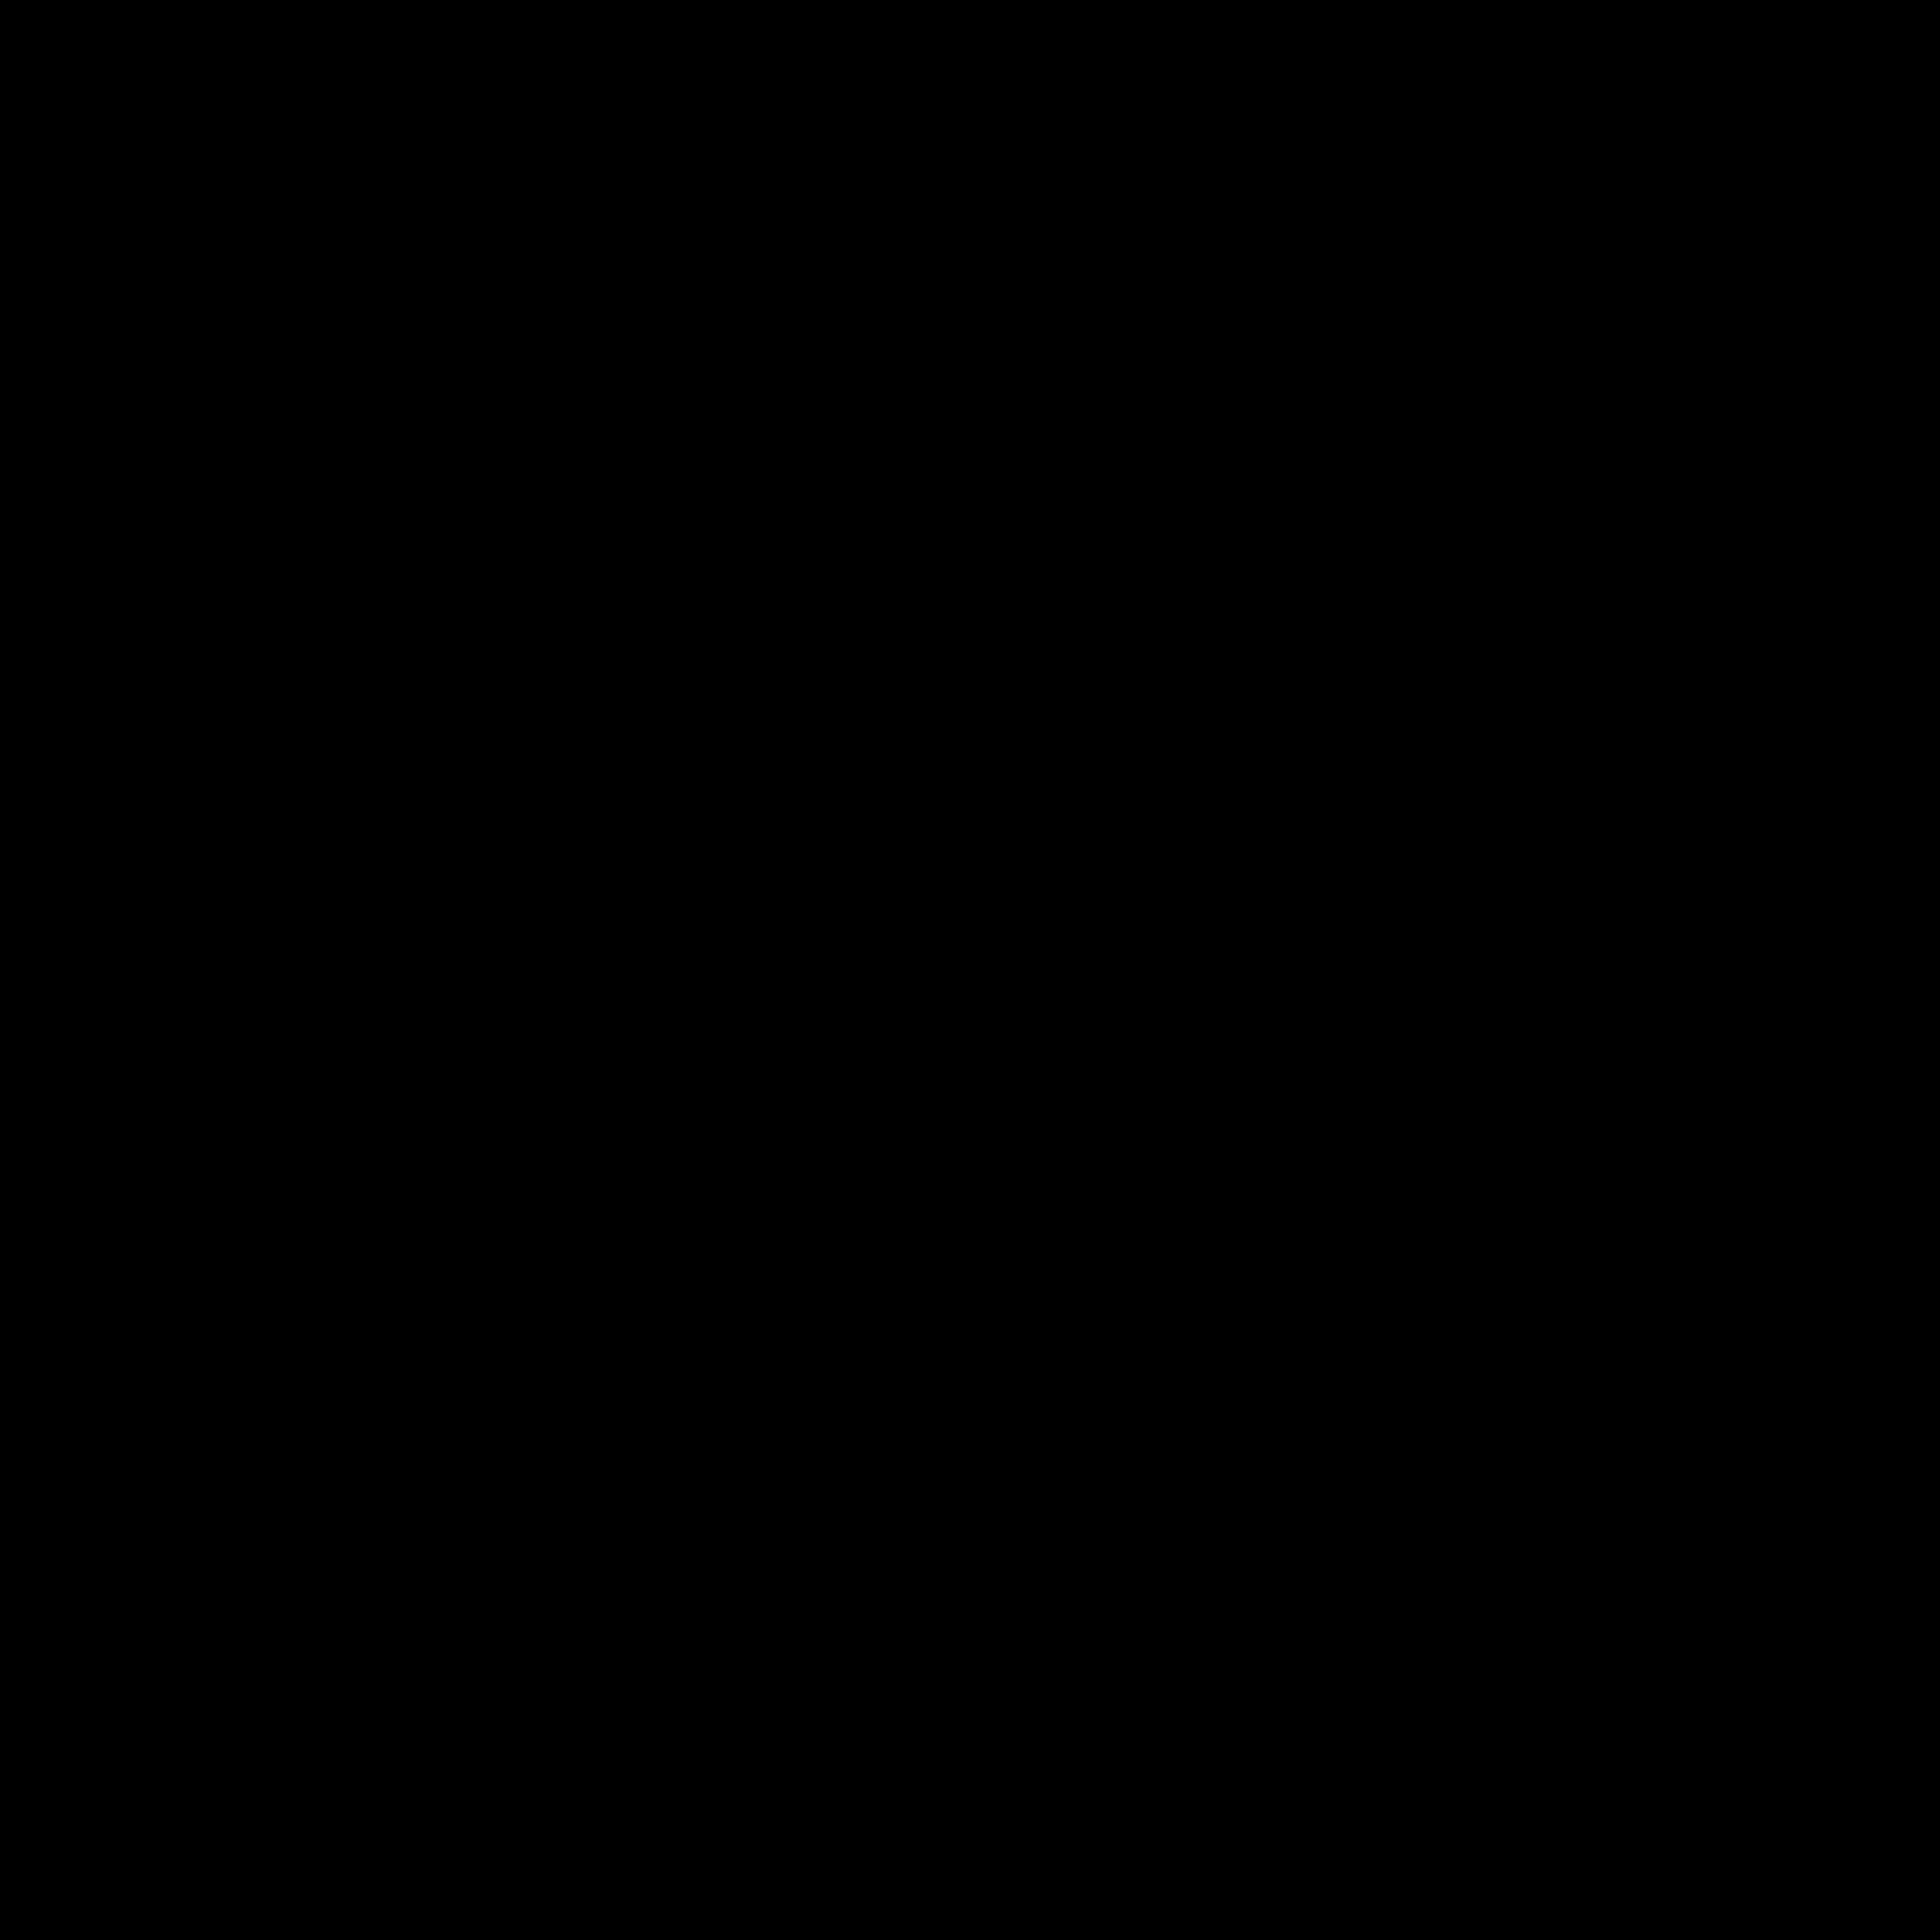 Image bc b c. Number 6 clipart logo